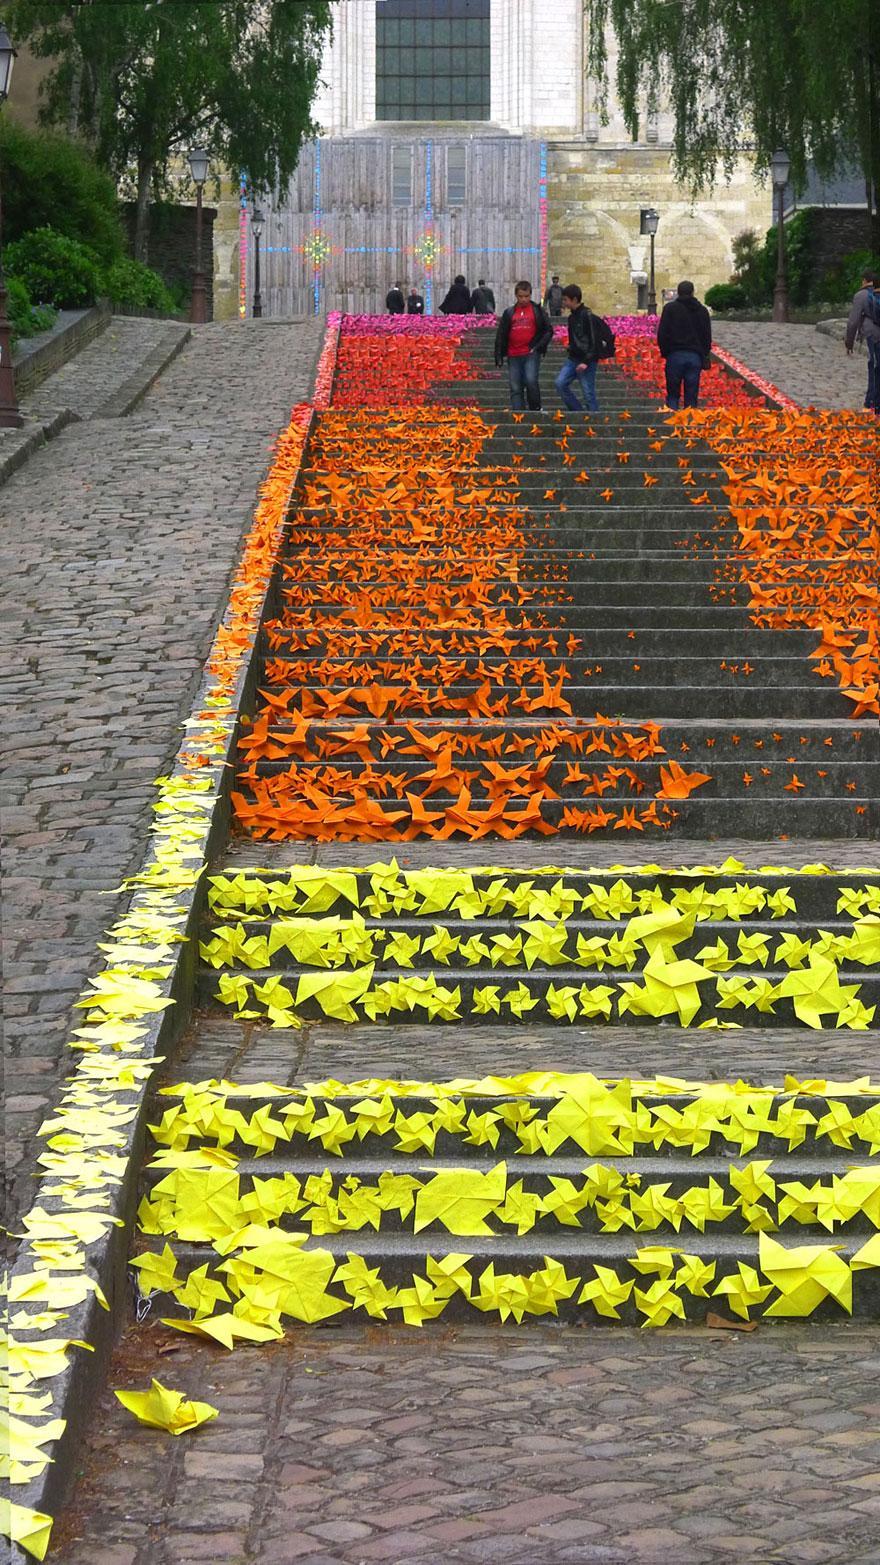 creative-stairs-street-art-5-1